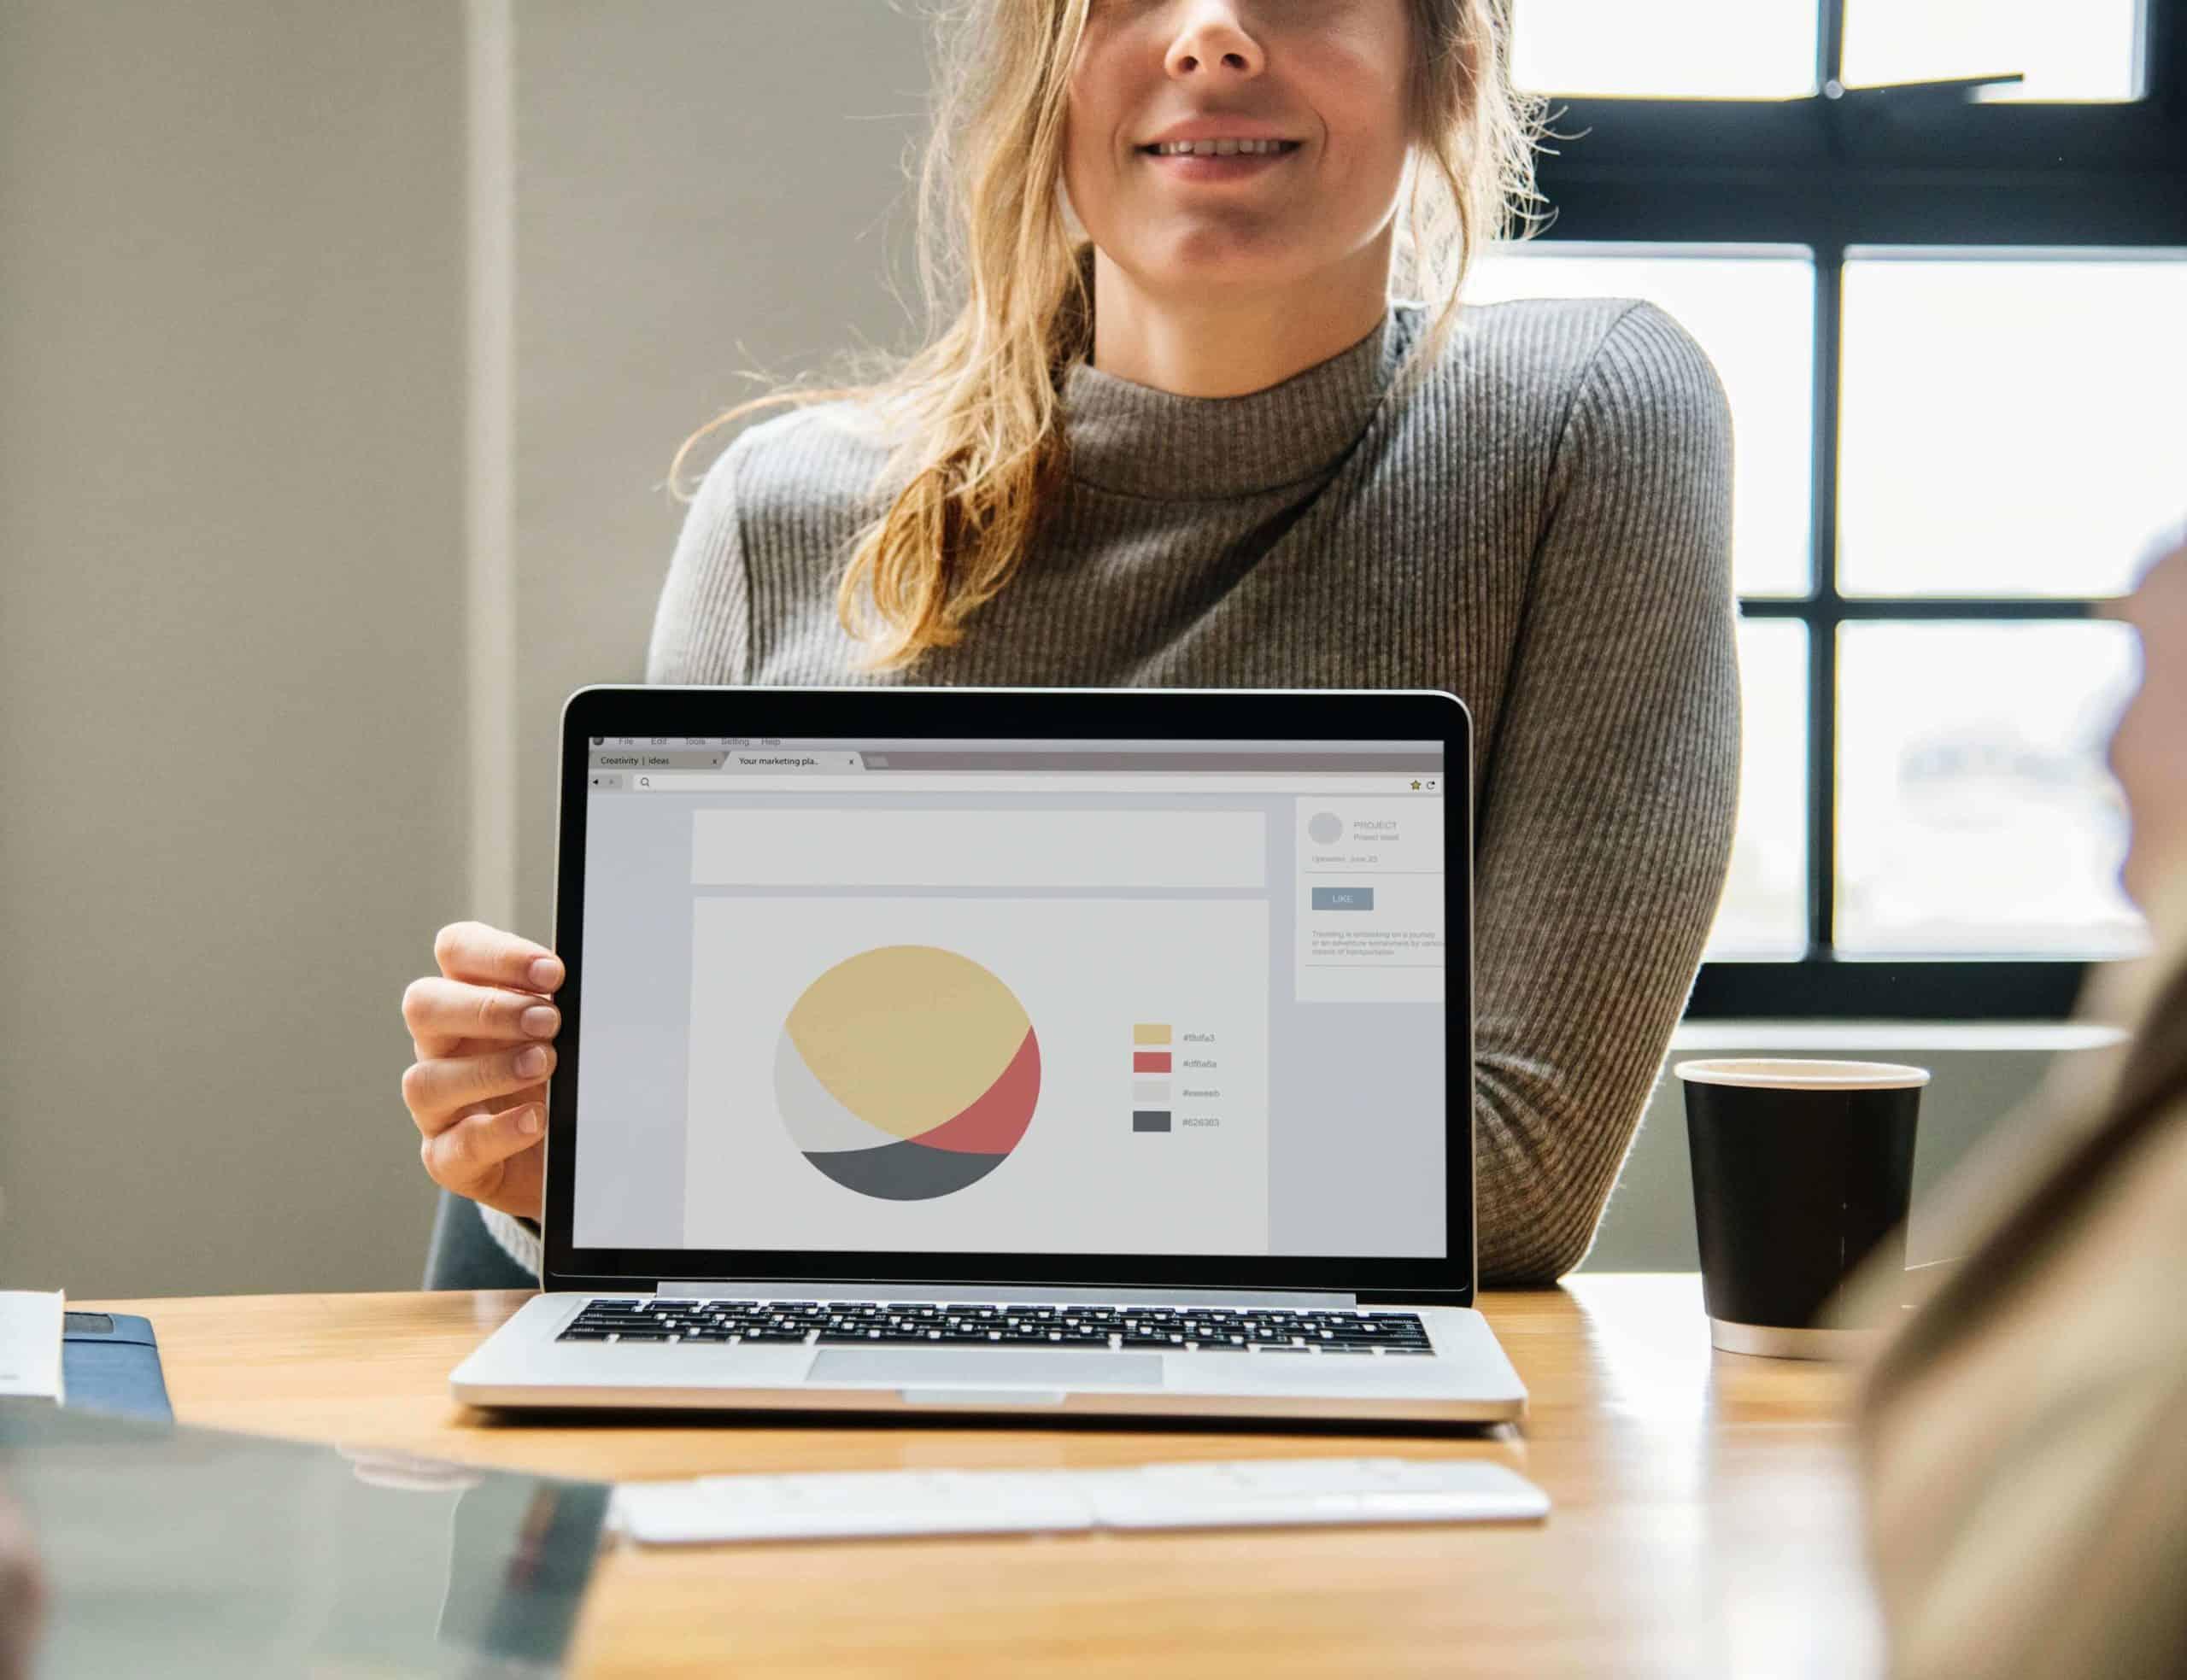 Control Group metrics